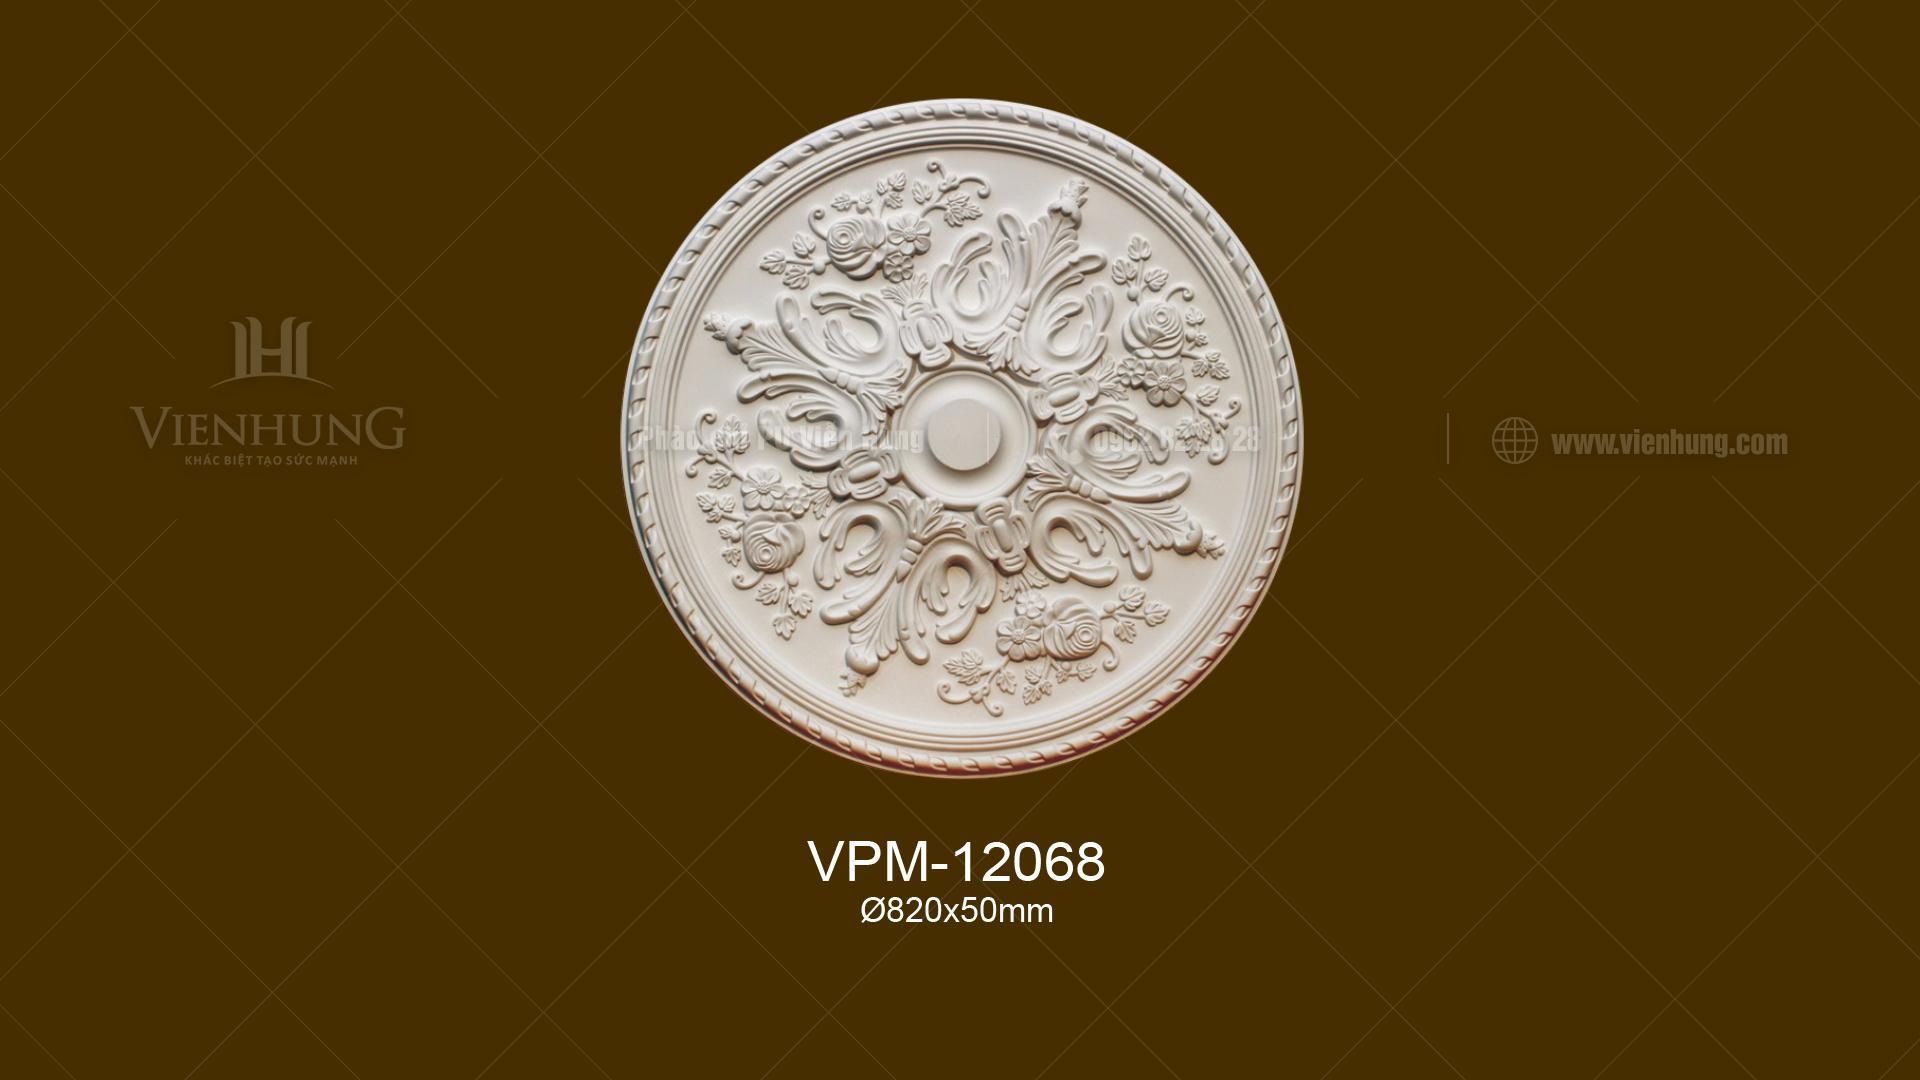 VPM-120680.jpg